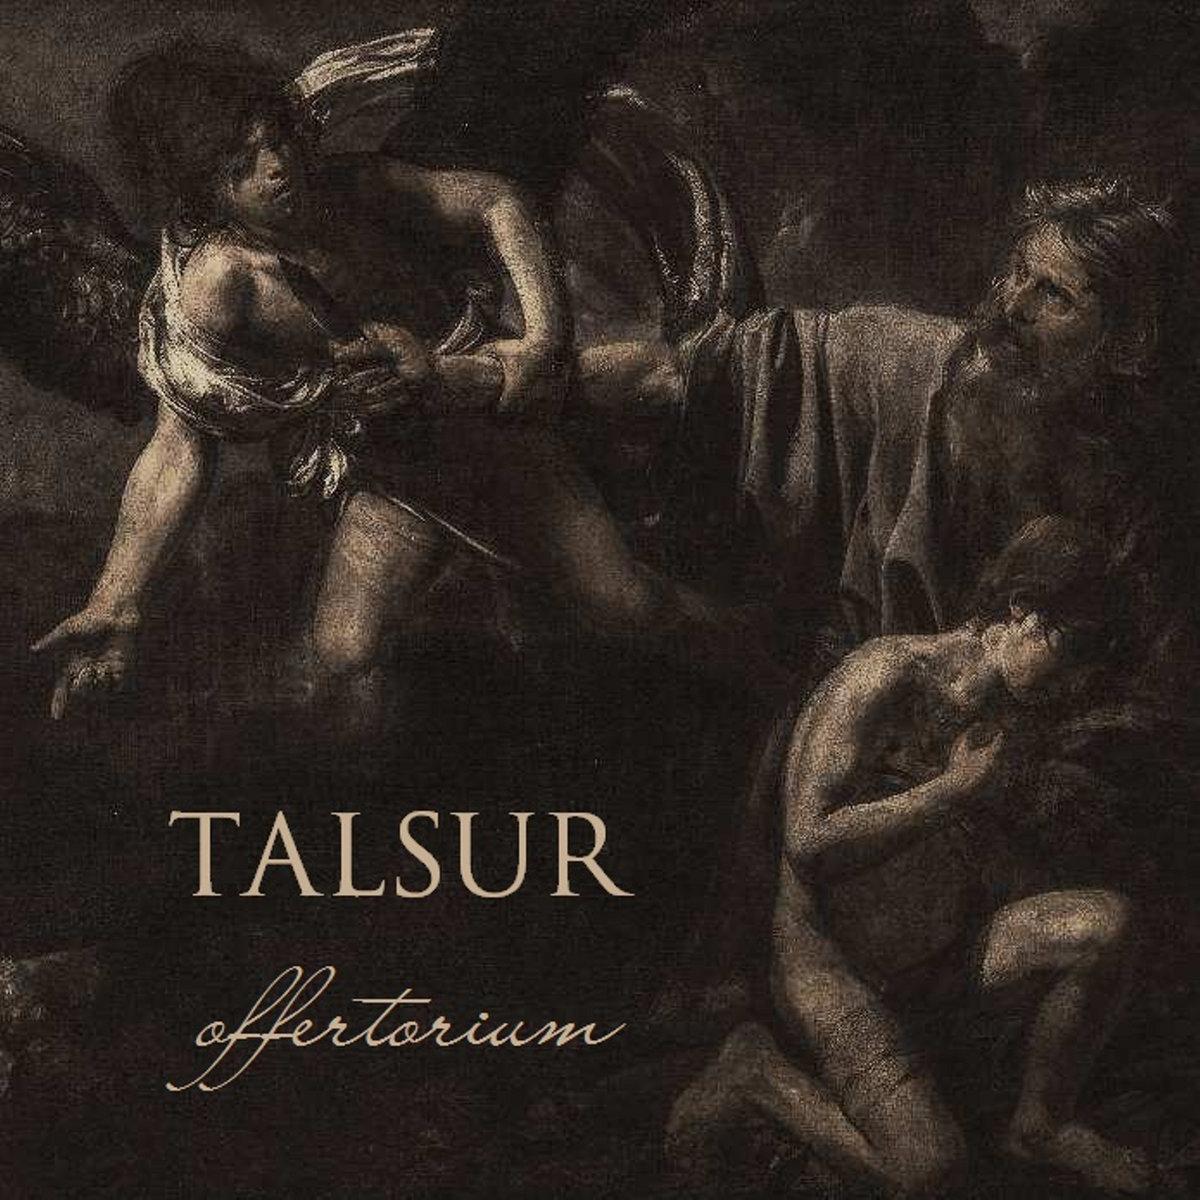 Talsur - Offertorium (EP) (2017)